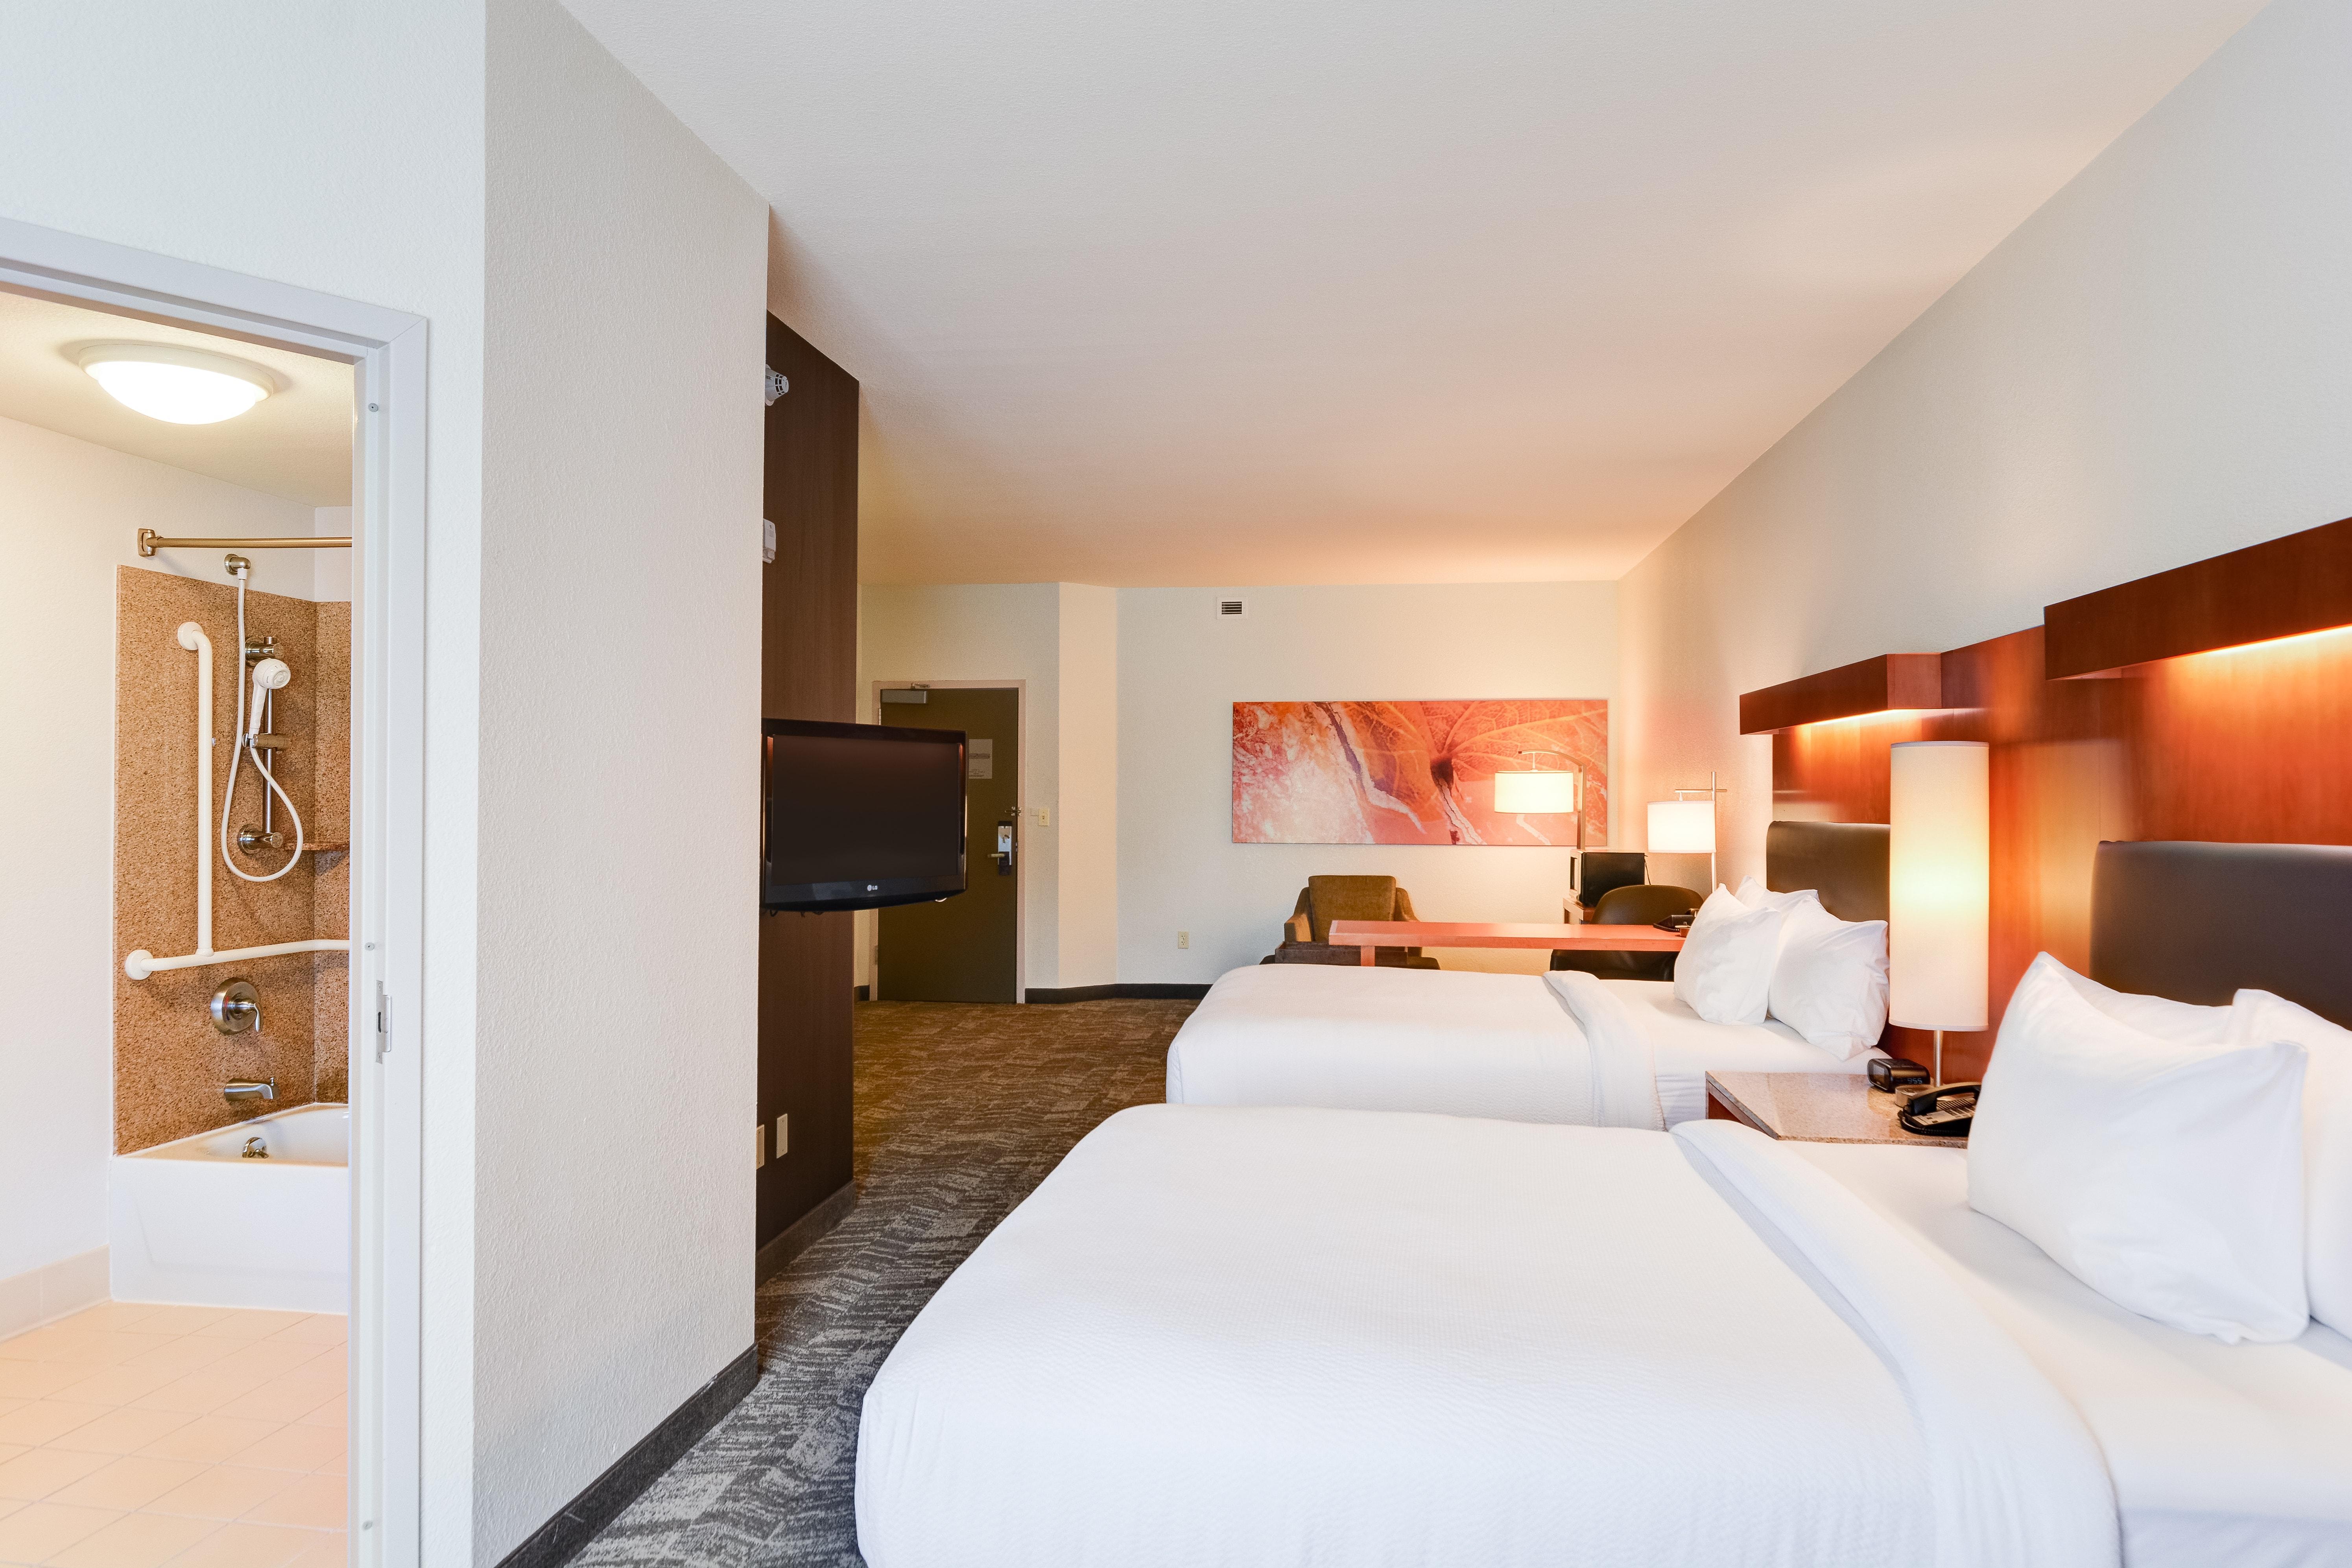 https://www.hotelsbyday.com/_data/default-hotel_image/3/15449/springhill-suites-bo-mglxf.jpg